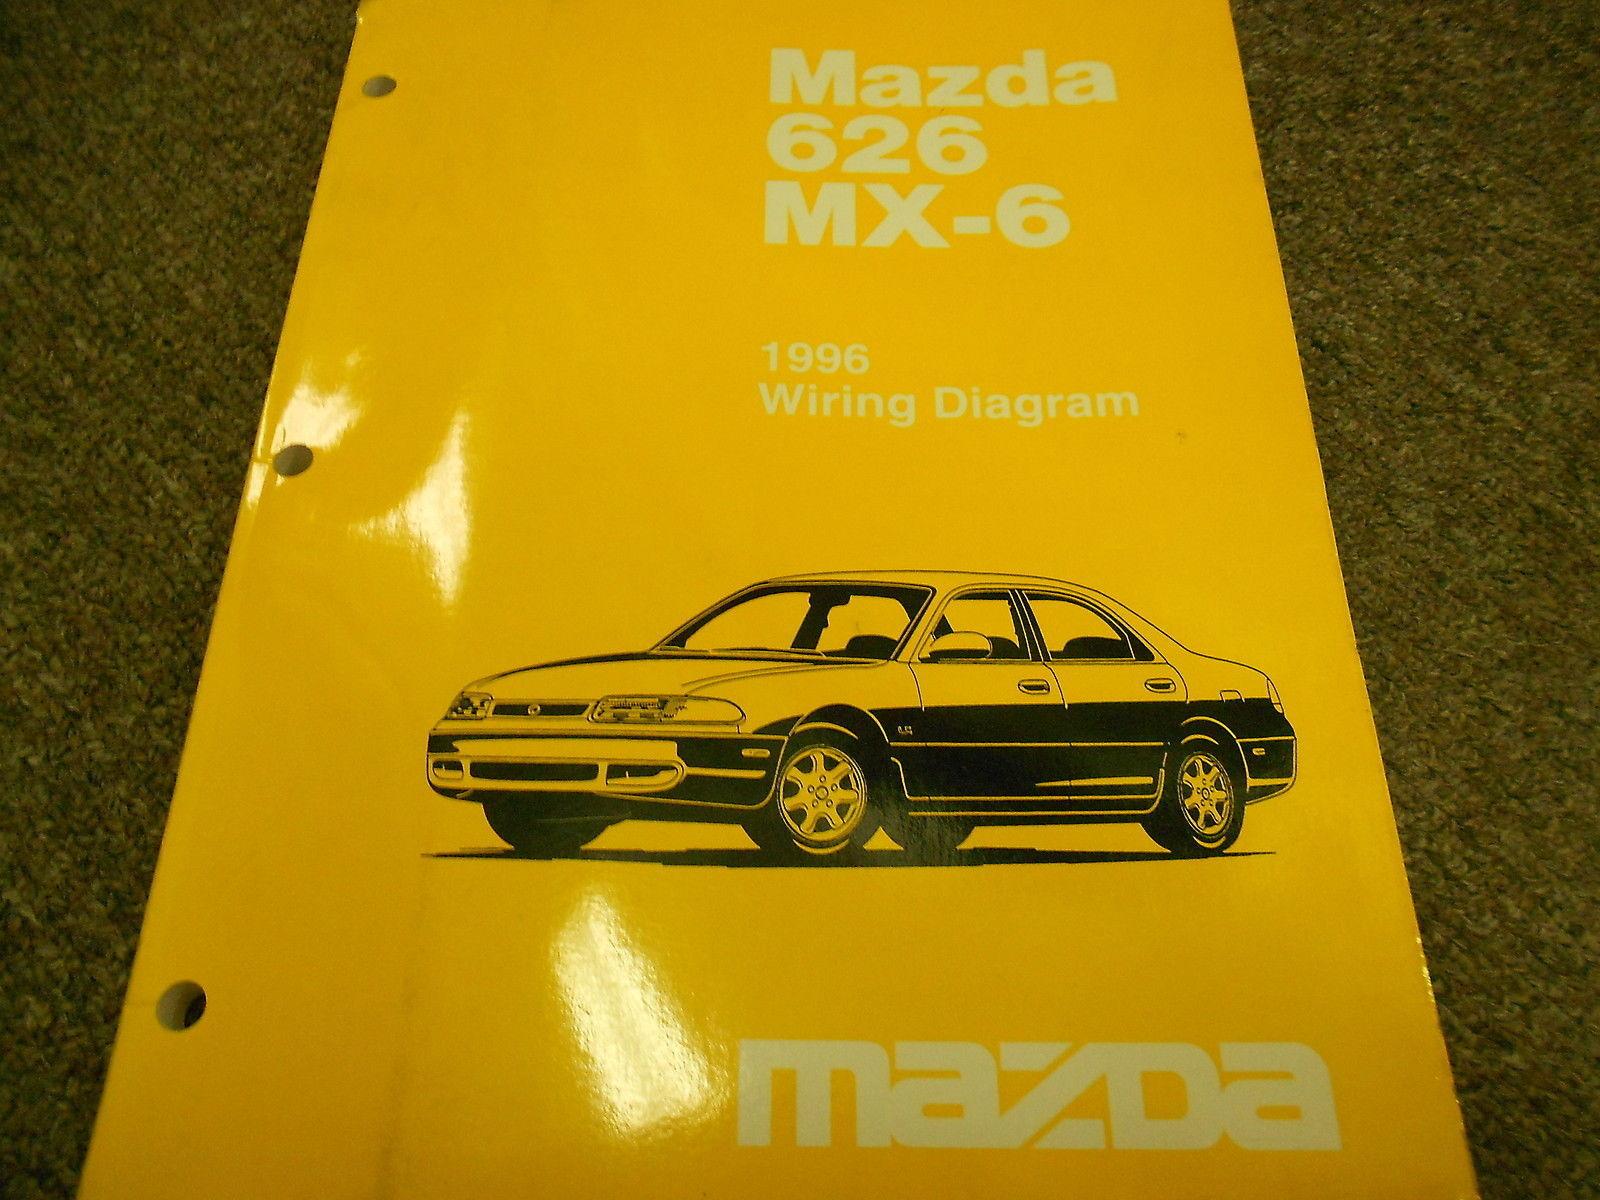 1996 MAZDA 626 MX-6 MX6 Electrical Wiring Diagram Service Repair Shop Manual  96 - $8.78